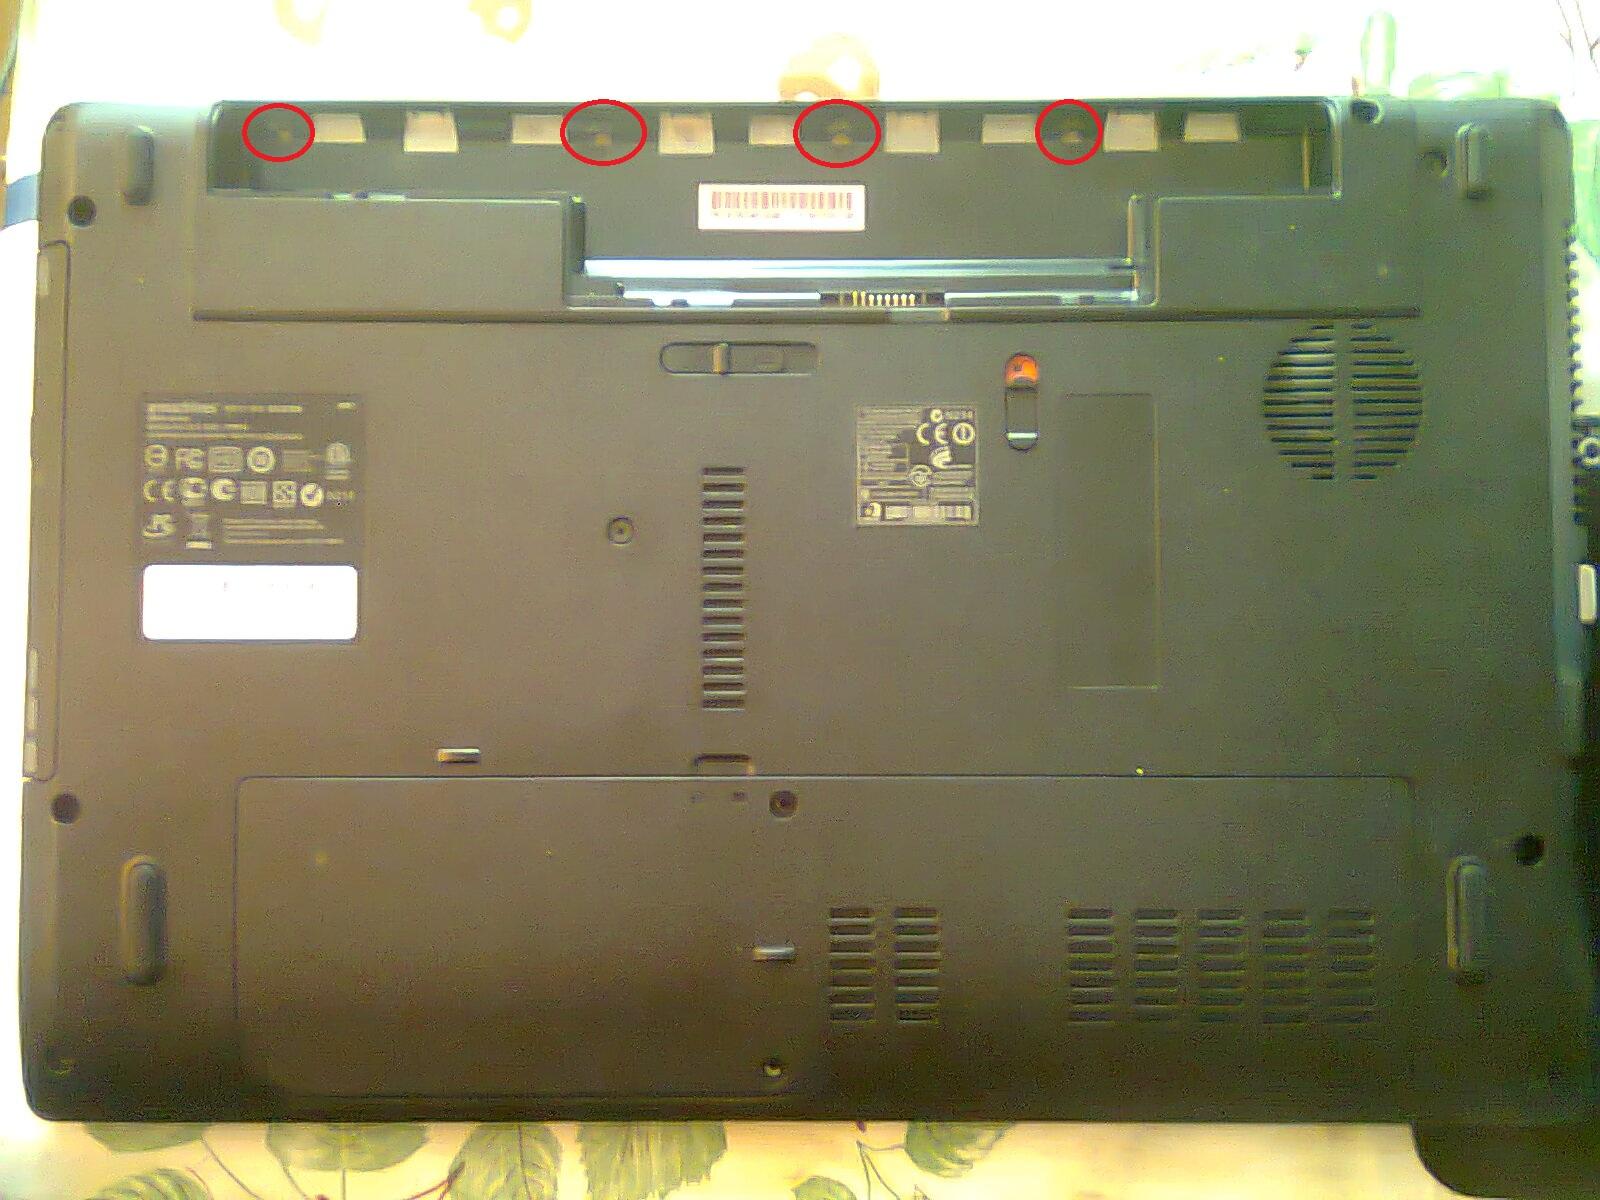 ноутбук lenovo z580 инструкция по разборке